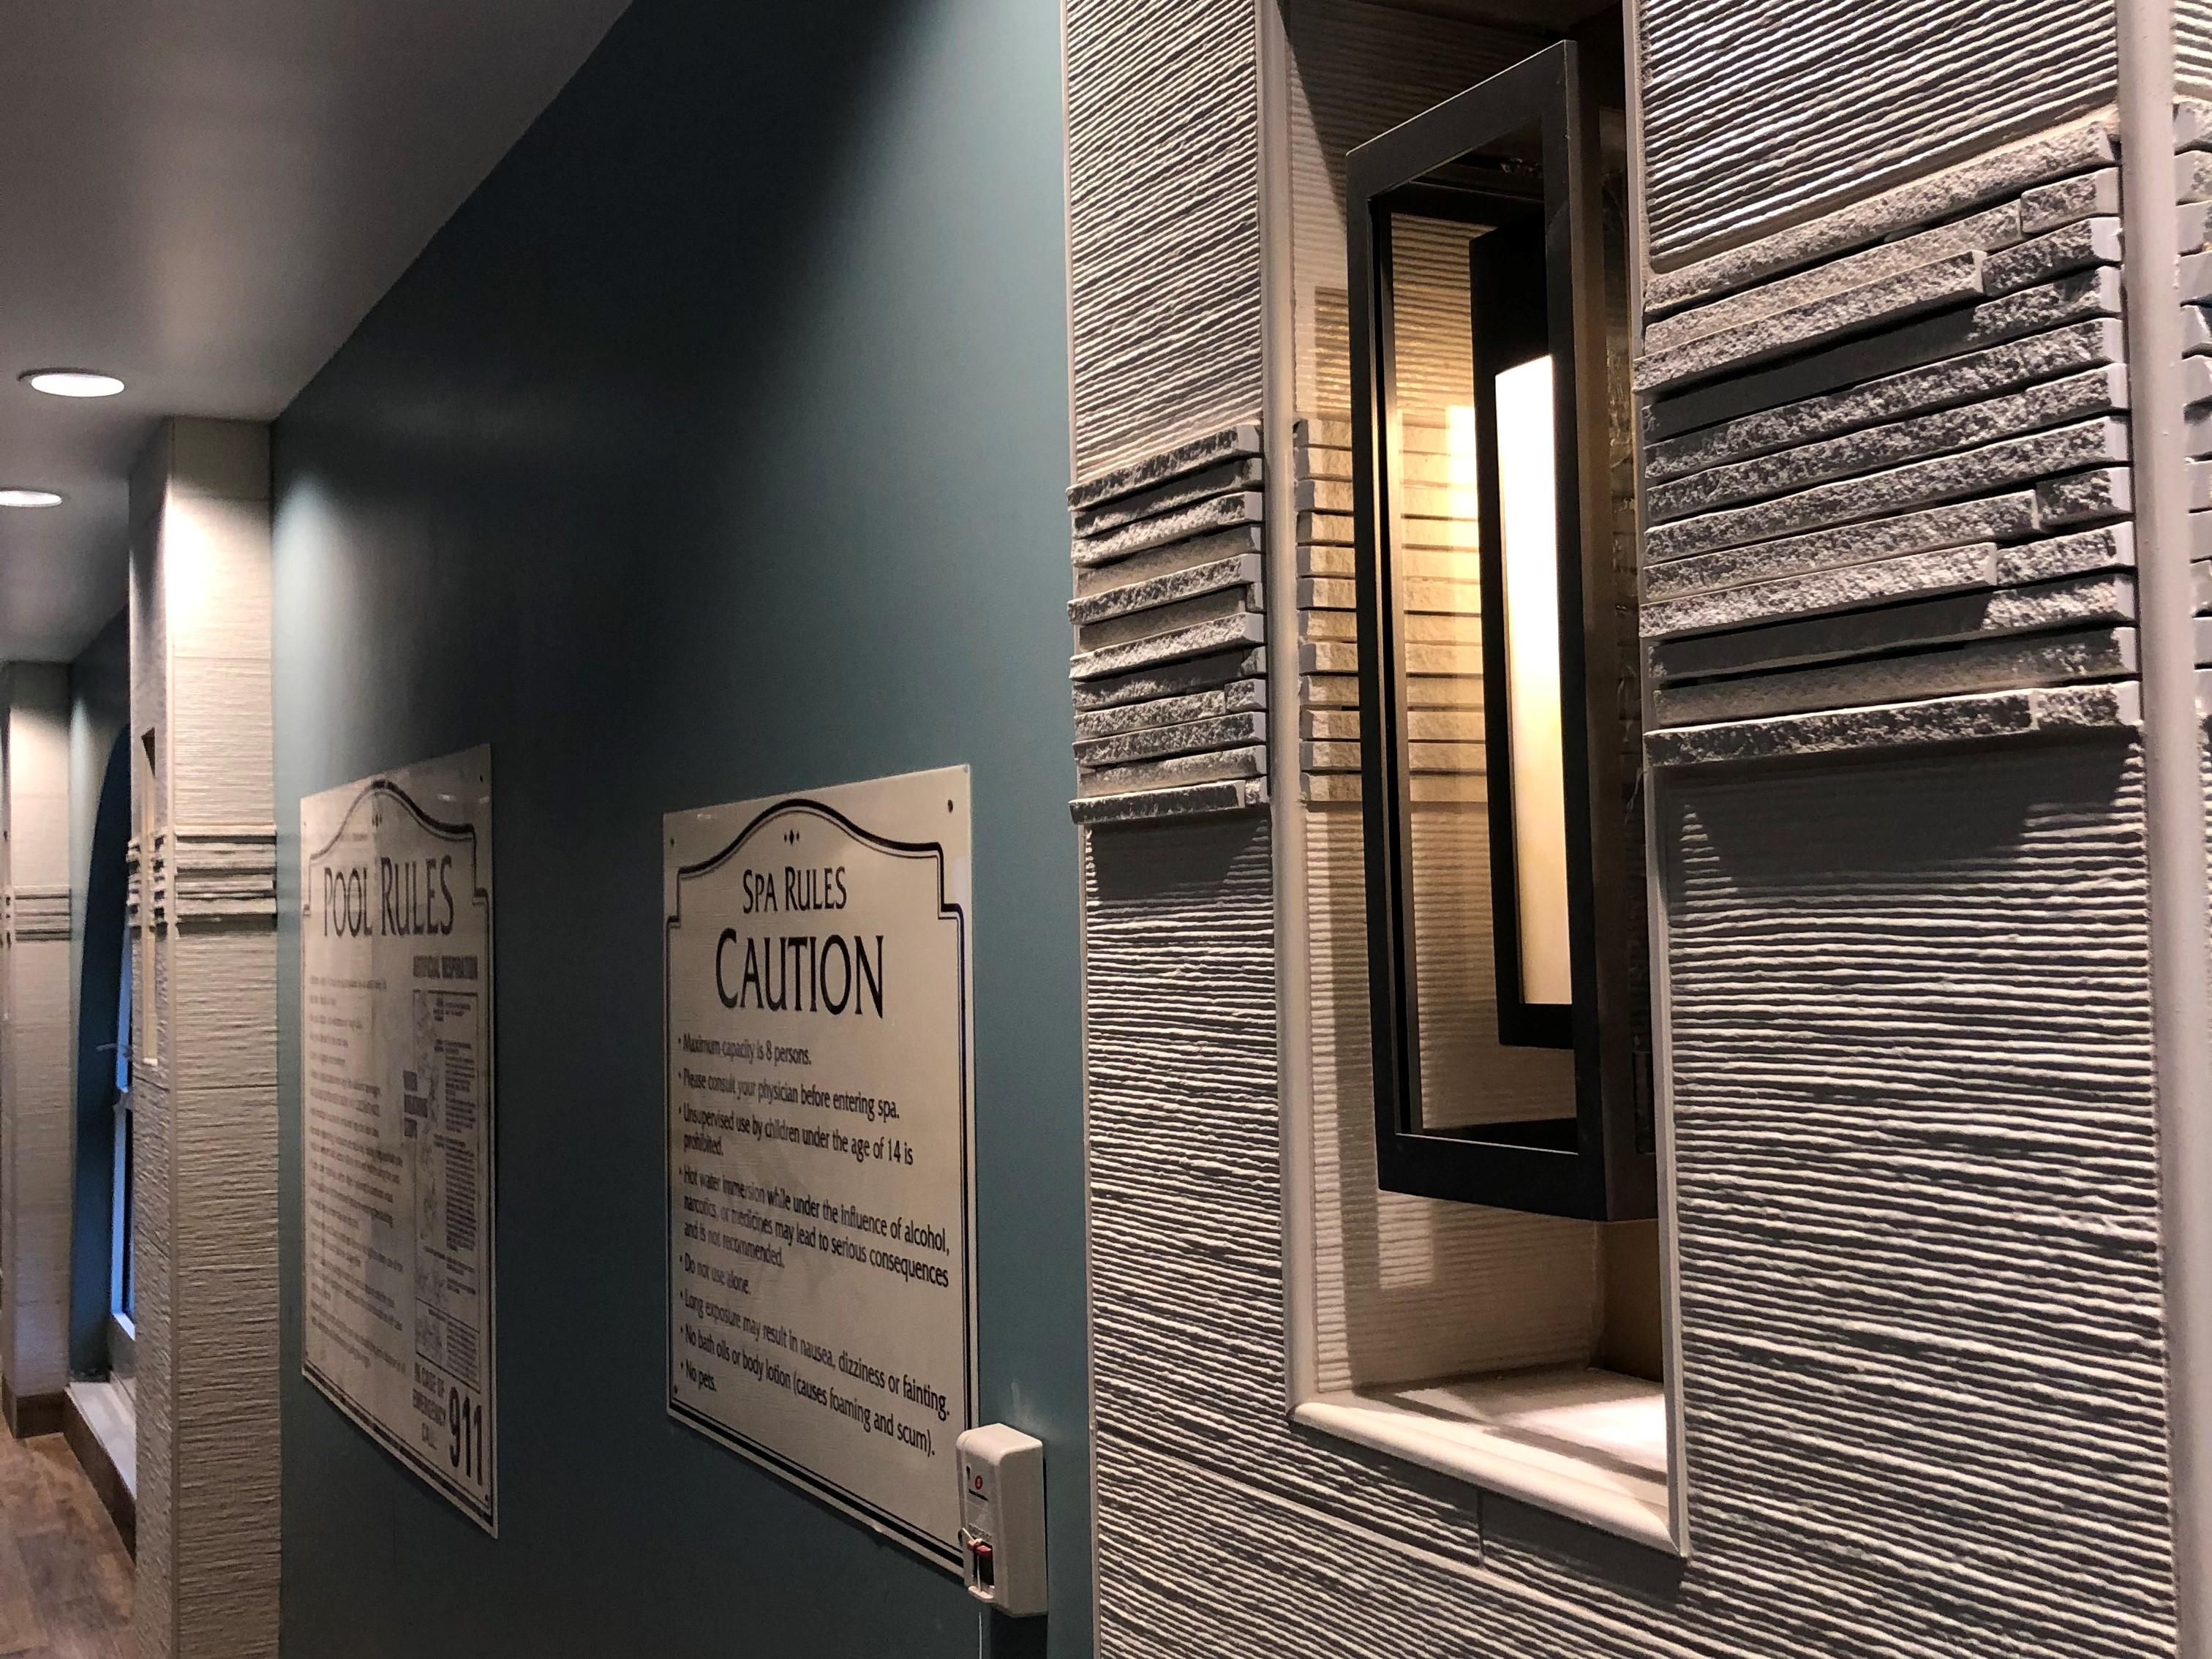 Interior Pool Remodel ceramic tile Mediterranean luxury trespa panels indoor pool senior care The Covington Aliso Viejo